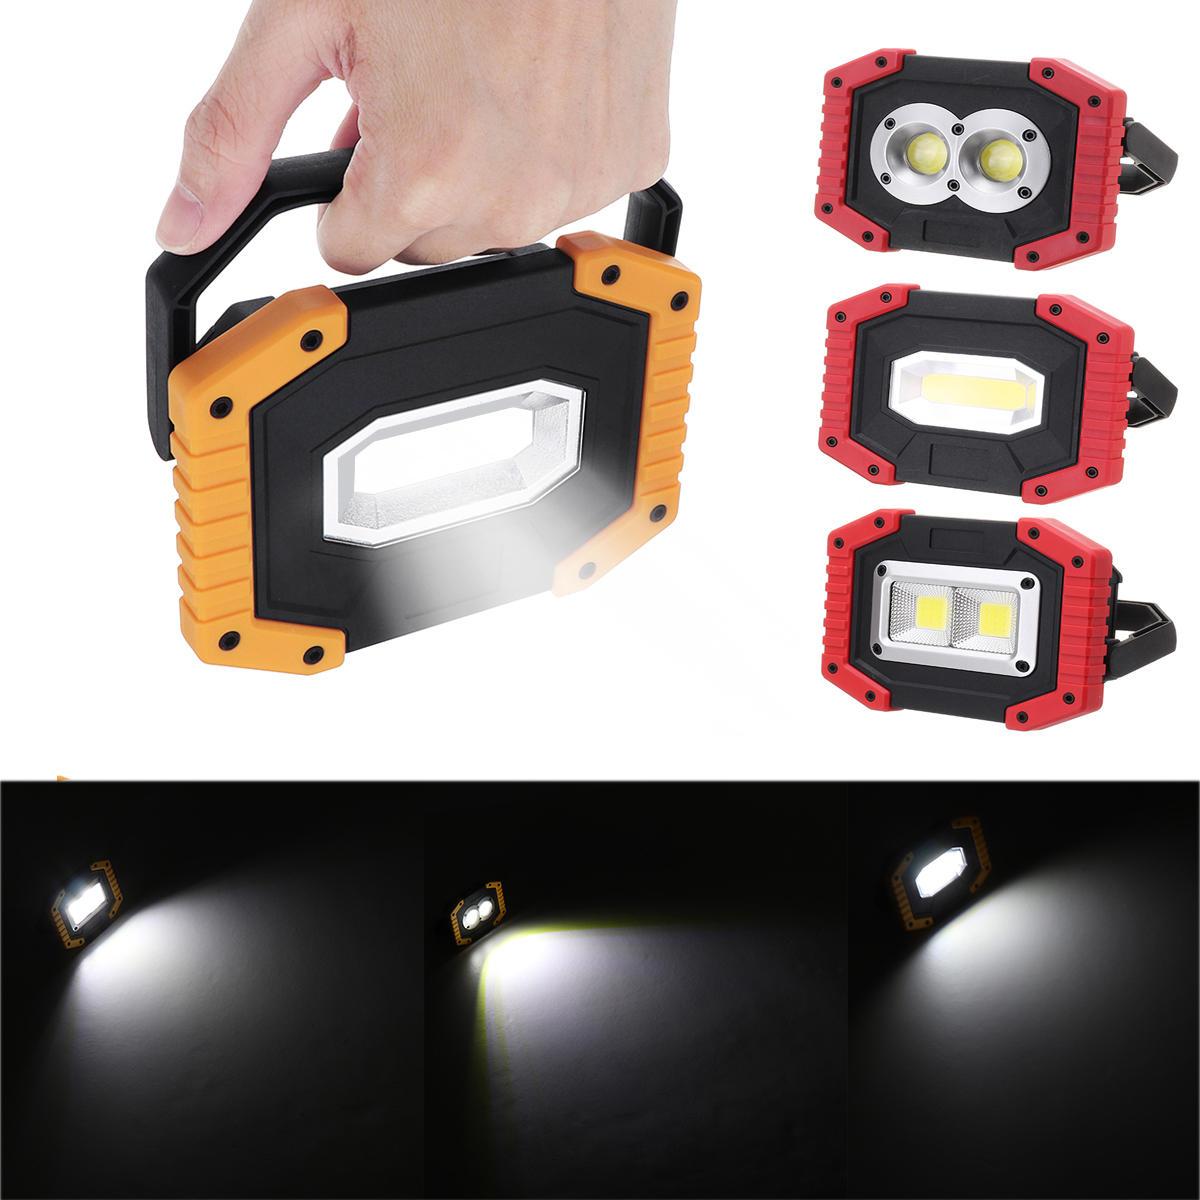 Xmund 30W USB LED COB Outdoor 3 Modes Work Light Camping Emergency Lantern Flashlight Spotlight Searchlight